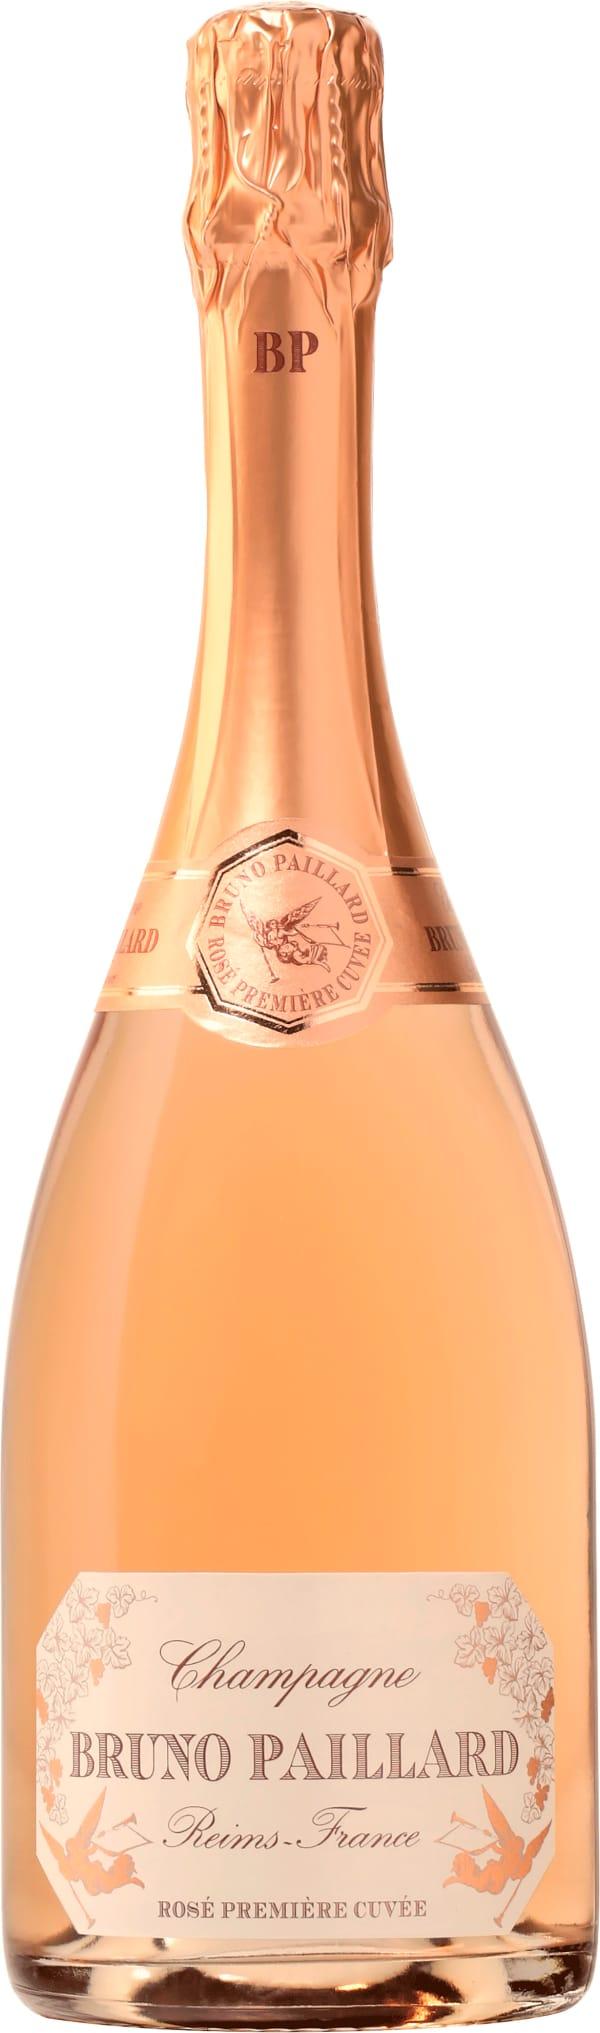 Bruno Paillard Première Cuvée Rosé Champagne Extra Brut